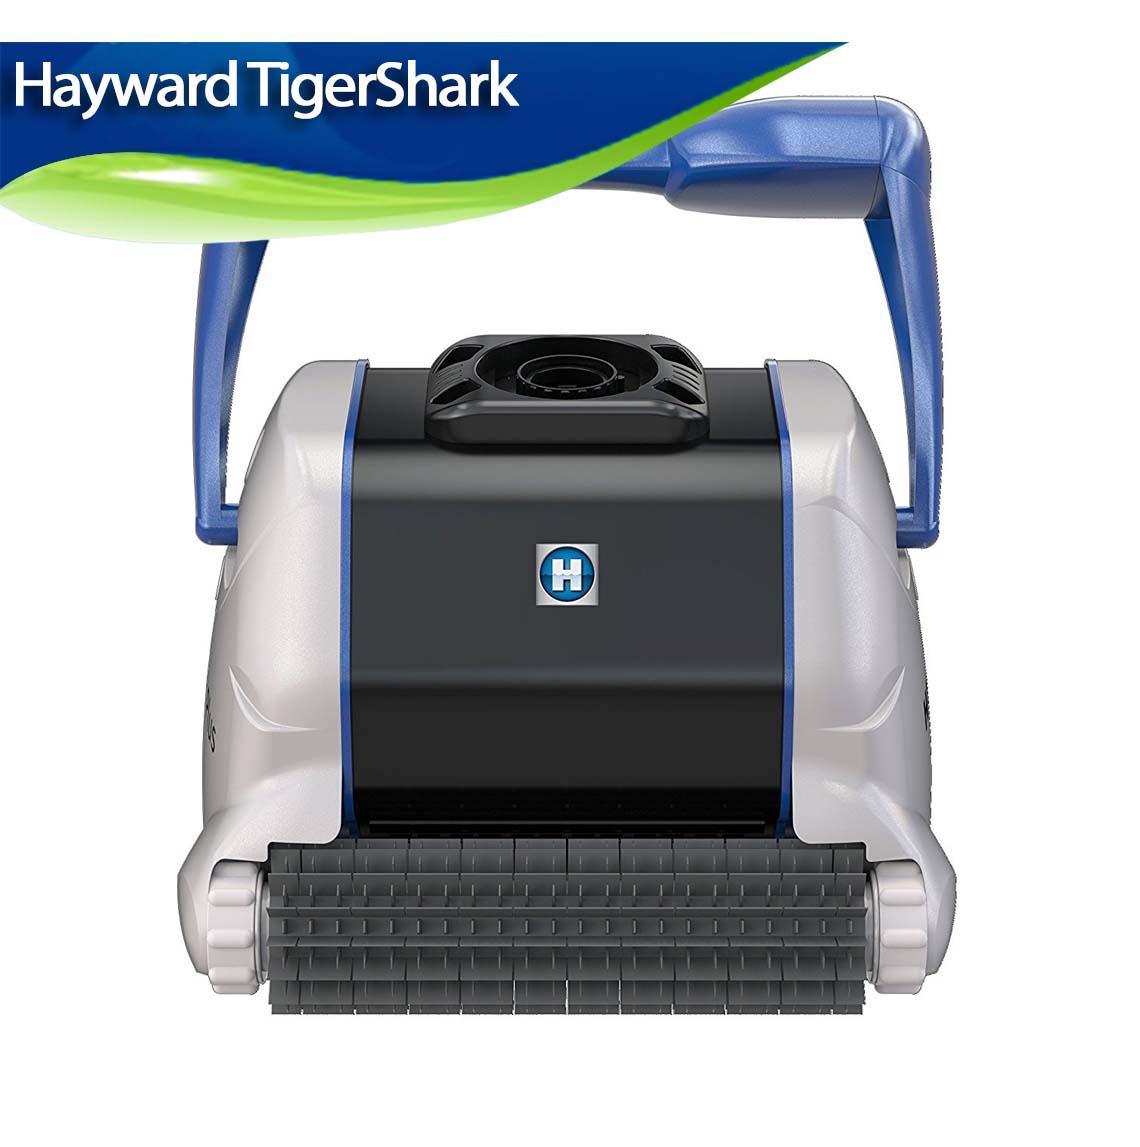 Hayward Tigershark Review Best Robotic Pool Cleaners